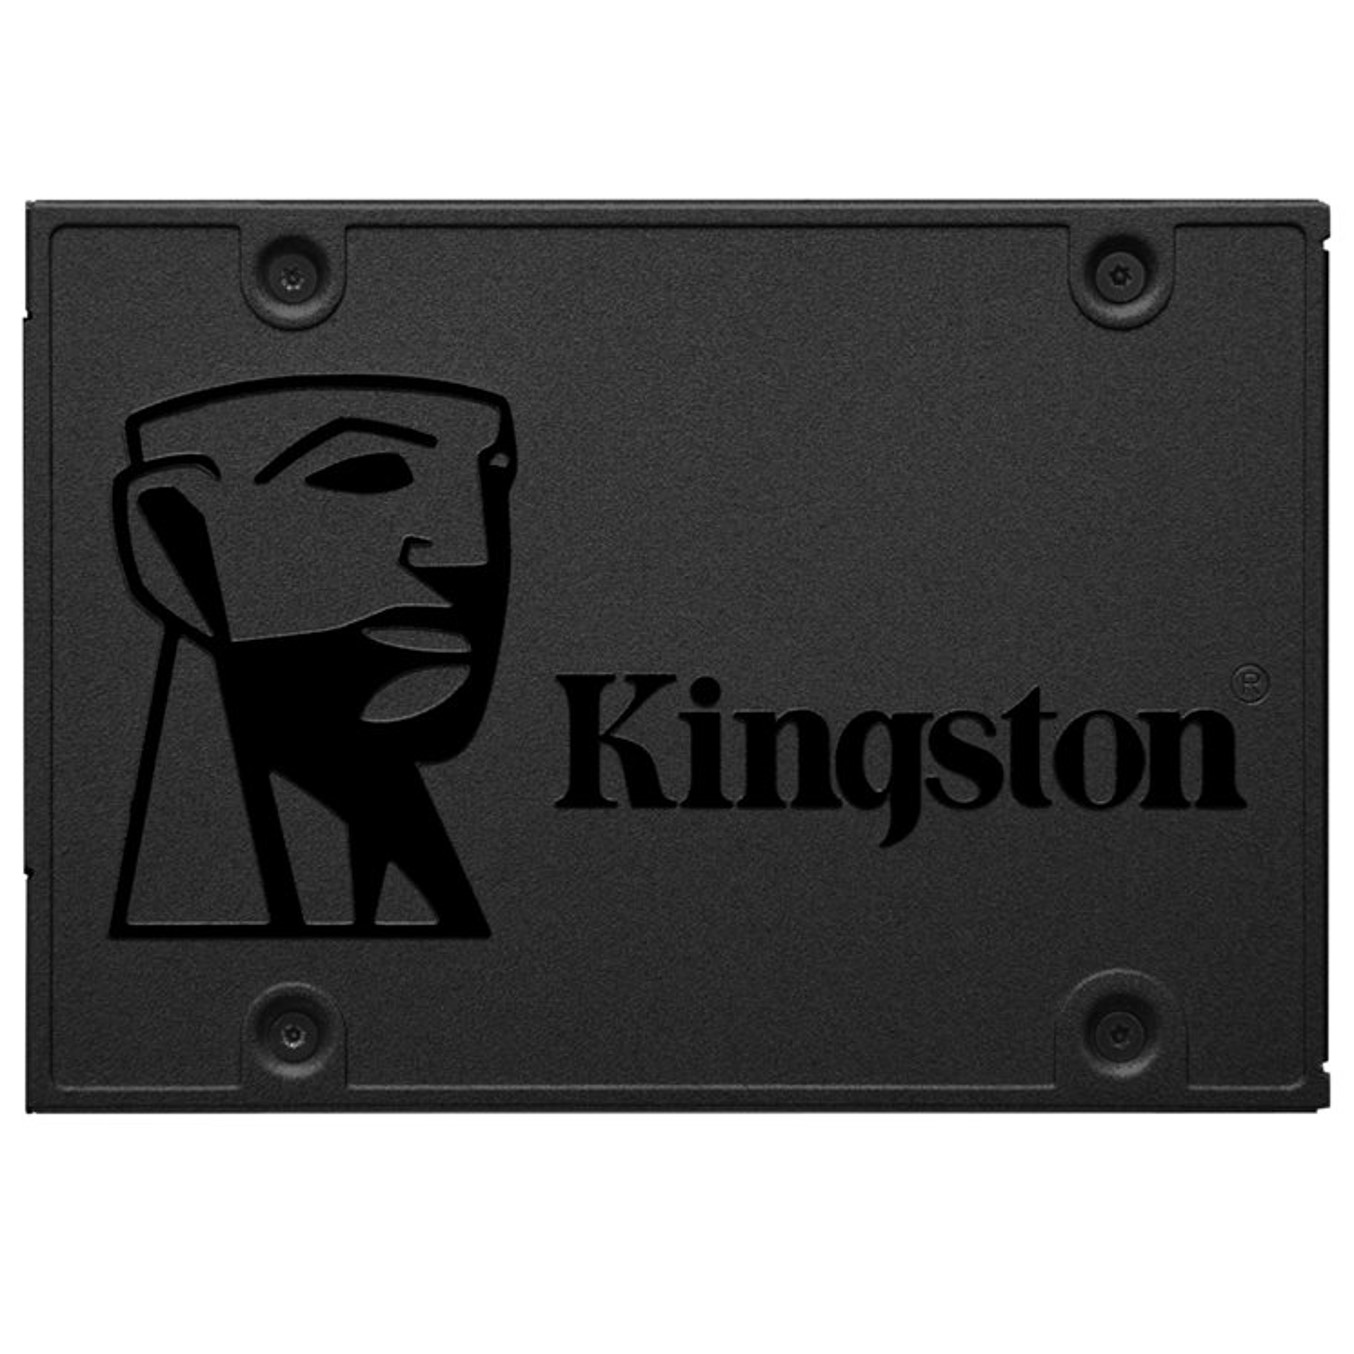 Disco-duro-interno-solido-hdd-ssd-kingston-ssdnow-a400-240gb-2-5-034-sata-6gb-s